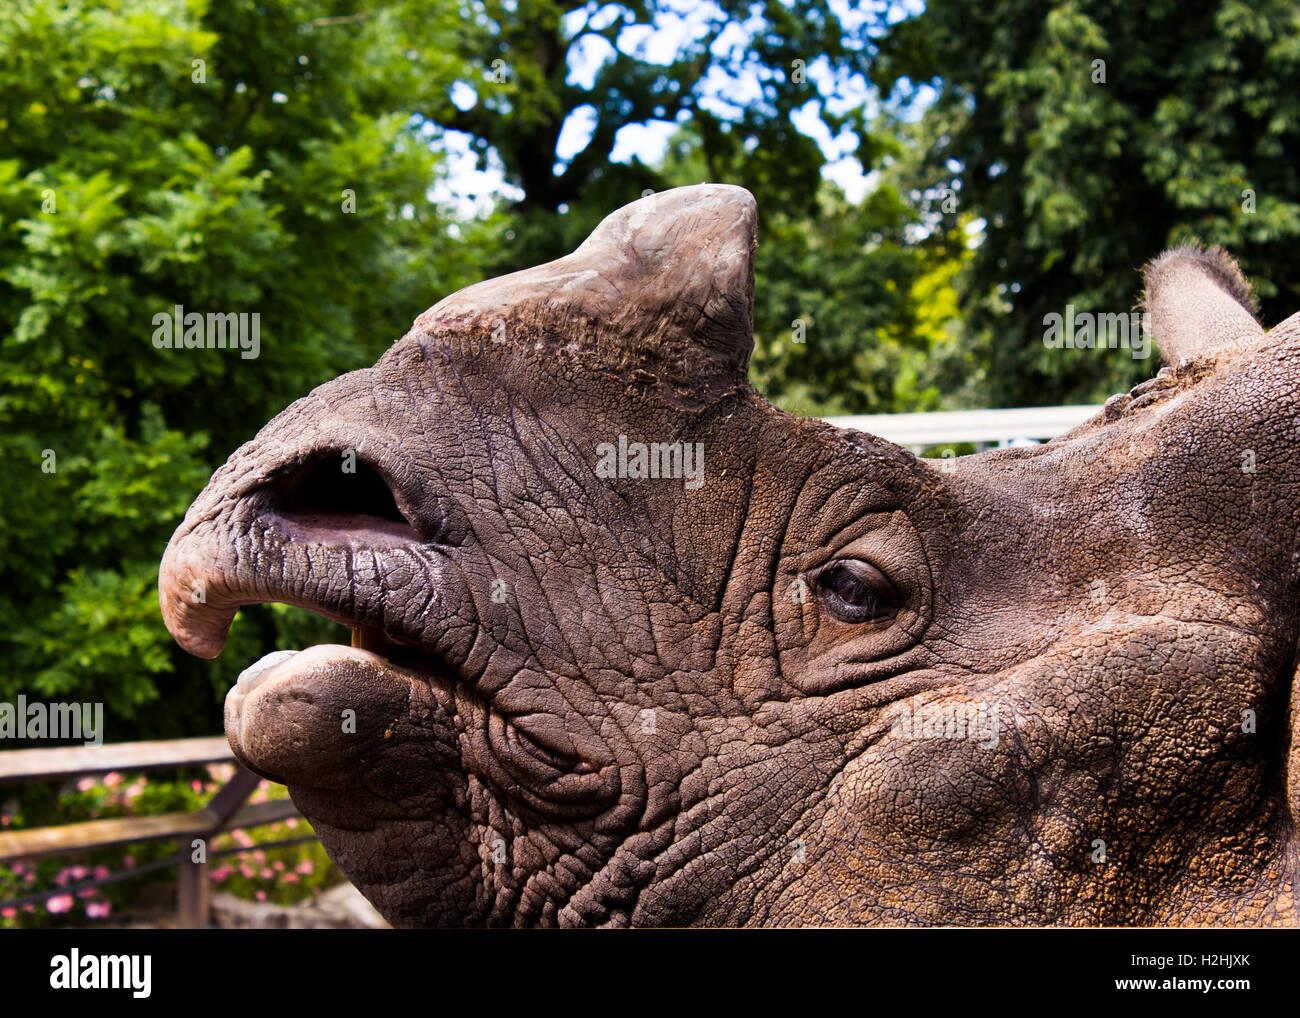 Rhino au Zoo d'Edimbourg Photo Stock